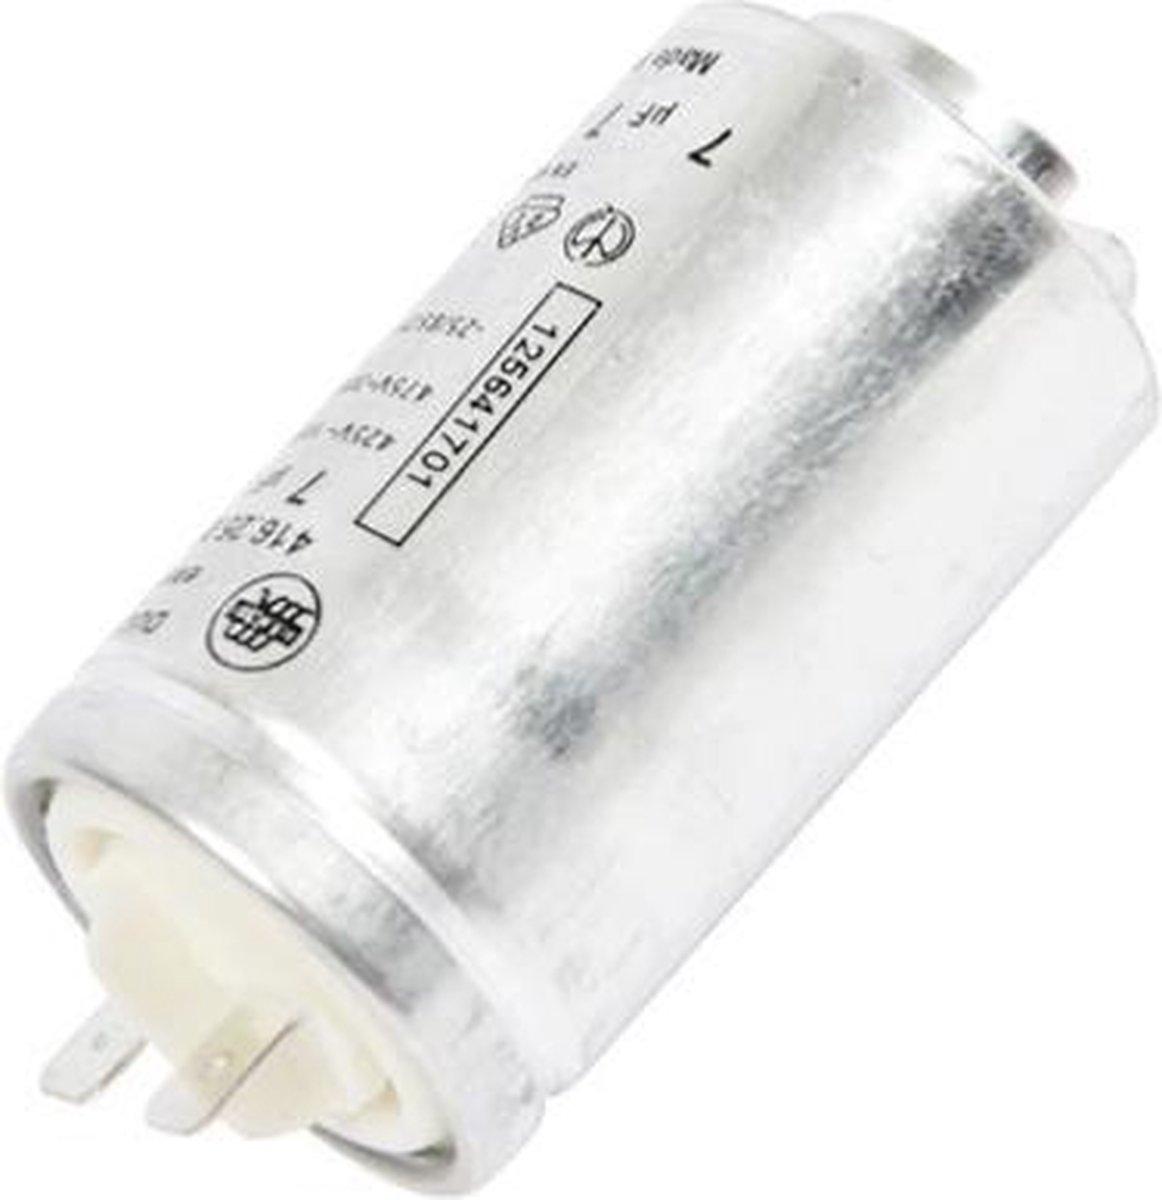 Condensator 7UF 7 uf  aanloopcondensator wasdroger droger Aeg Electrolux